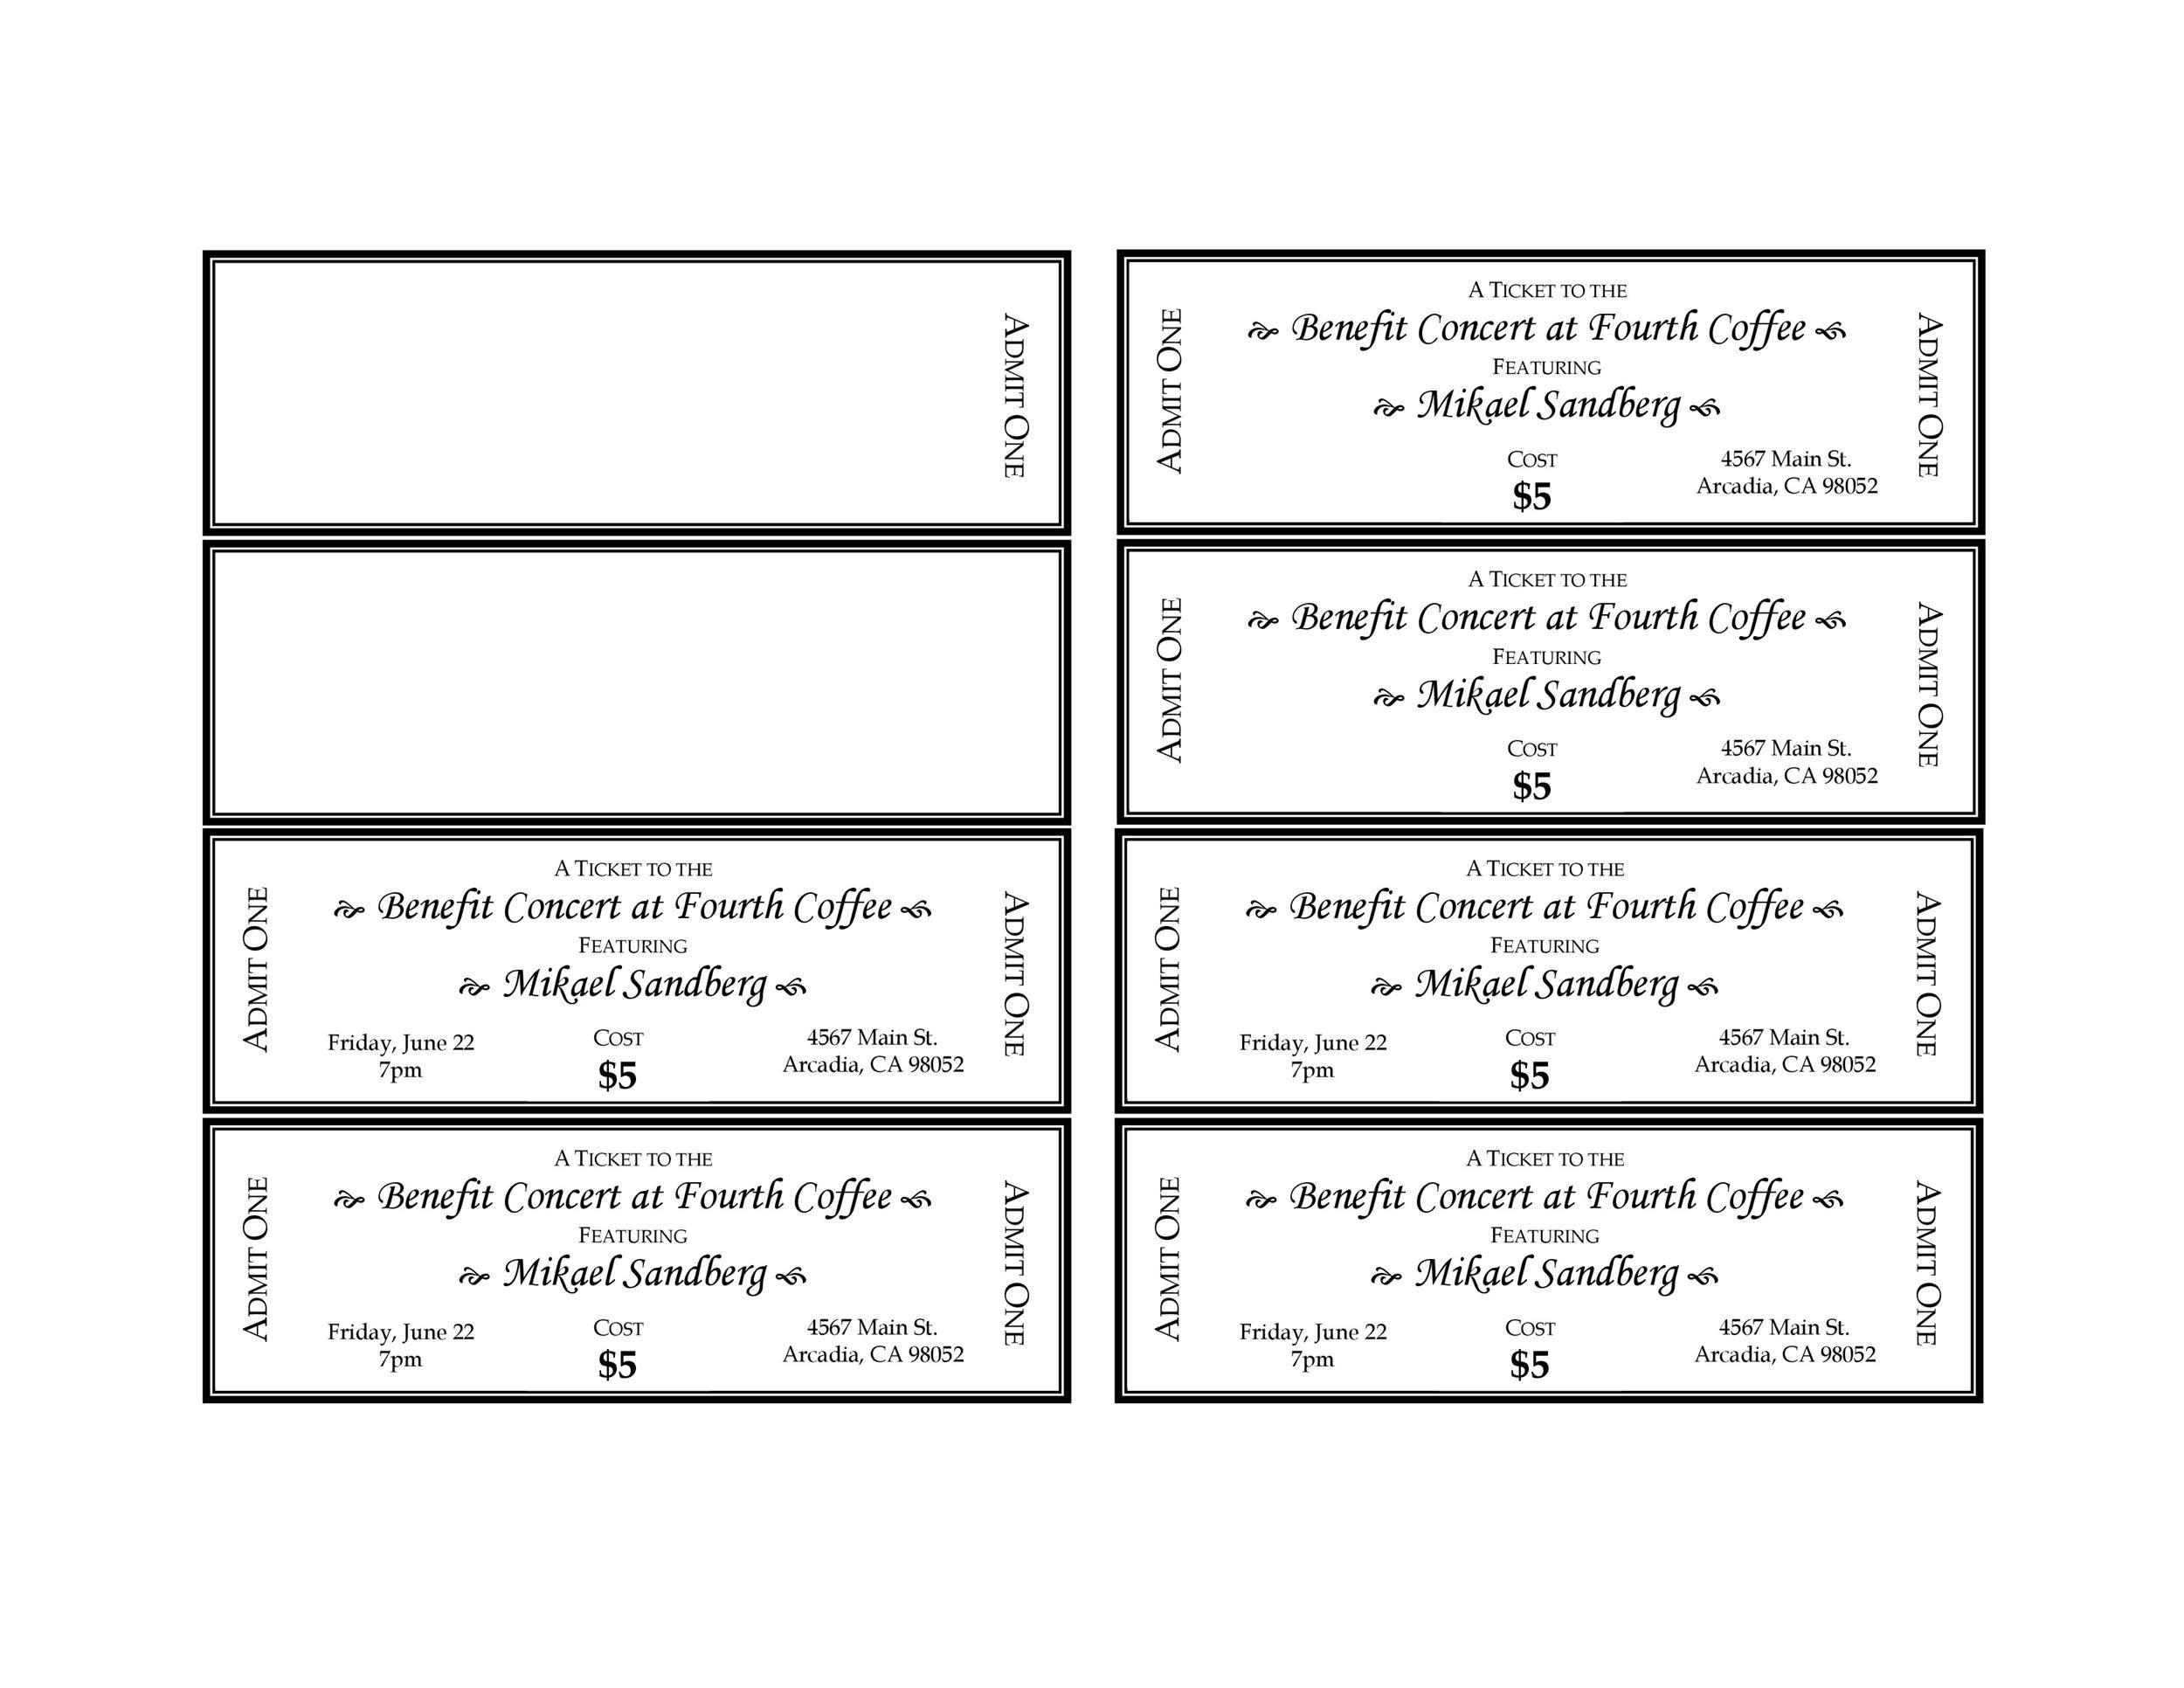 Plate Sale Ticket Template 40 free editable raffle and movie – Plate Sale Ticket Template